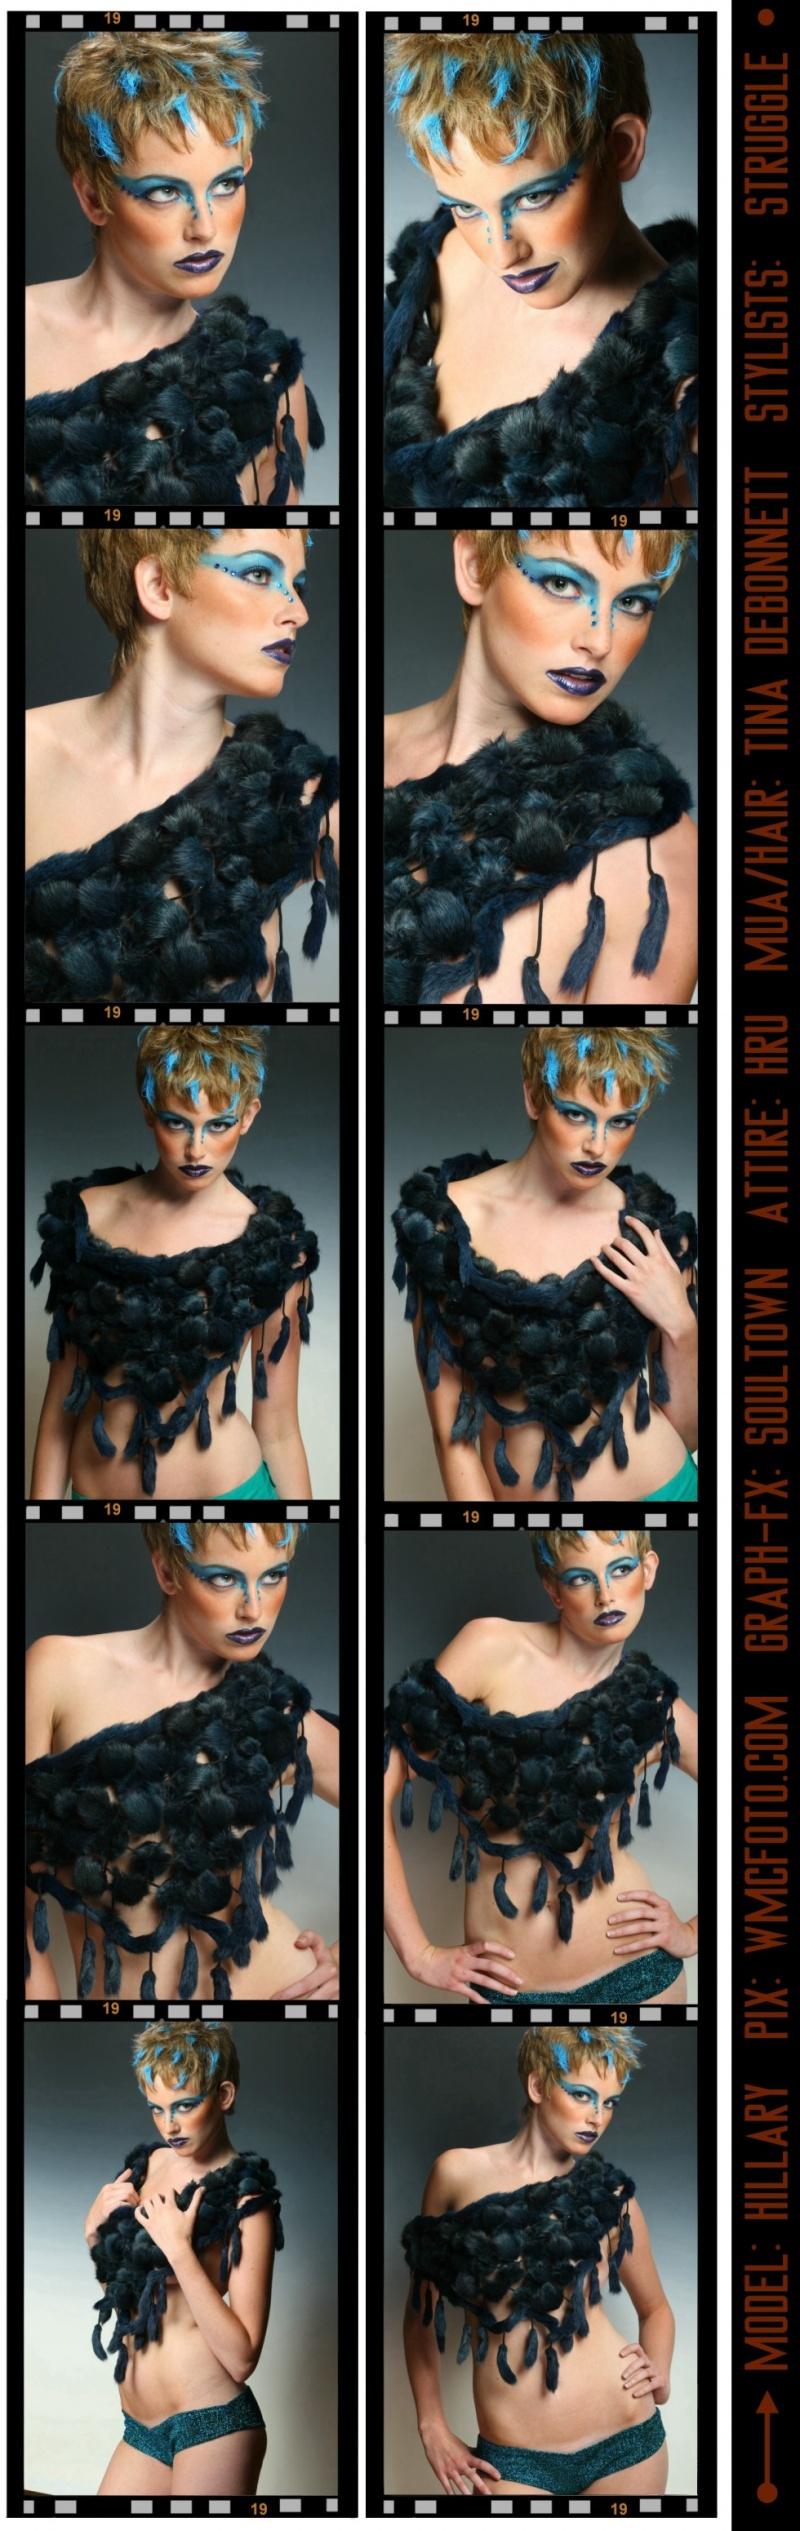 FYRE Boutique Loft. Nov 28, 2008 (c) 2008. WMCPhoto.com/HRU. Foxy Blu. Genuine Fox Fur wrap in Denim Blue. Bootay shortz in Teal and Black.  MODEL: HILLARY,  FOTO: WMCFOTO.COM.  RETOUCHES & GRAPH-FX: SOULTOWN.  MUA/HAIR: TINA DEBONNETT.  FASHION: HRU.  STYLISTS: STRUGGLE.